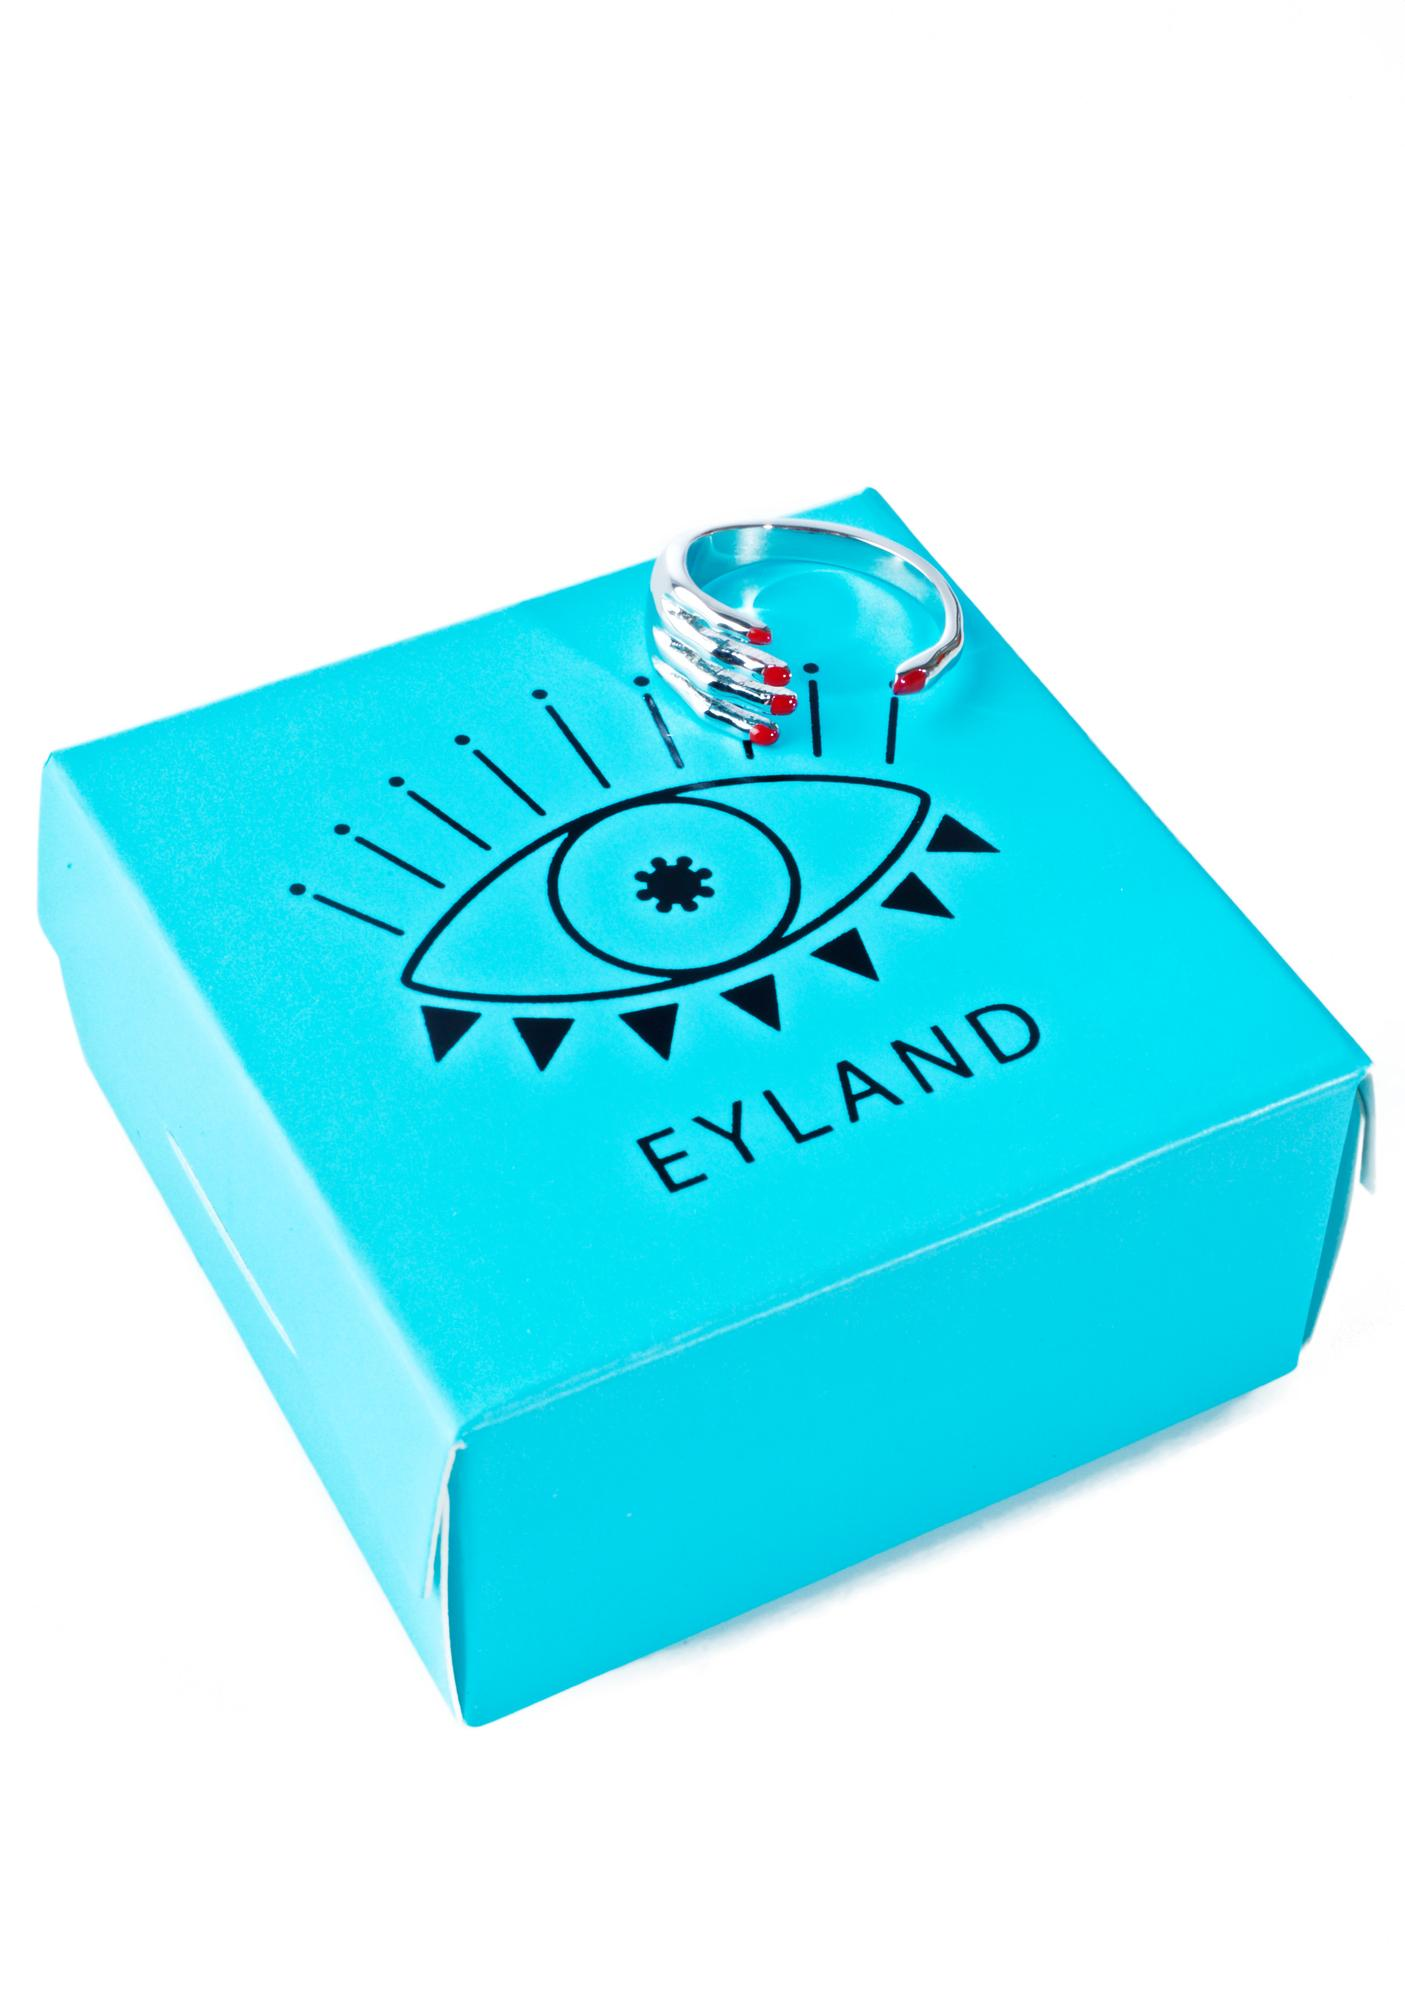 Eyland Jewellery Jaakola Ring